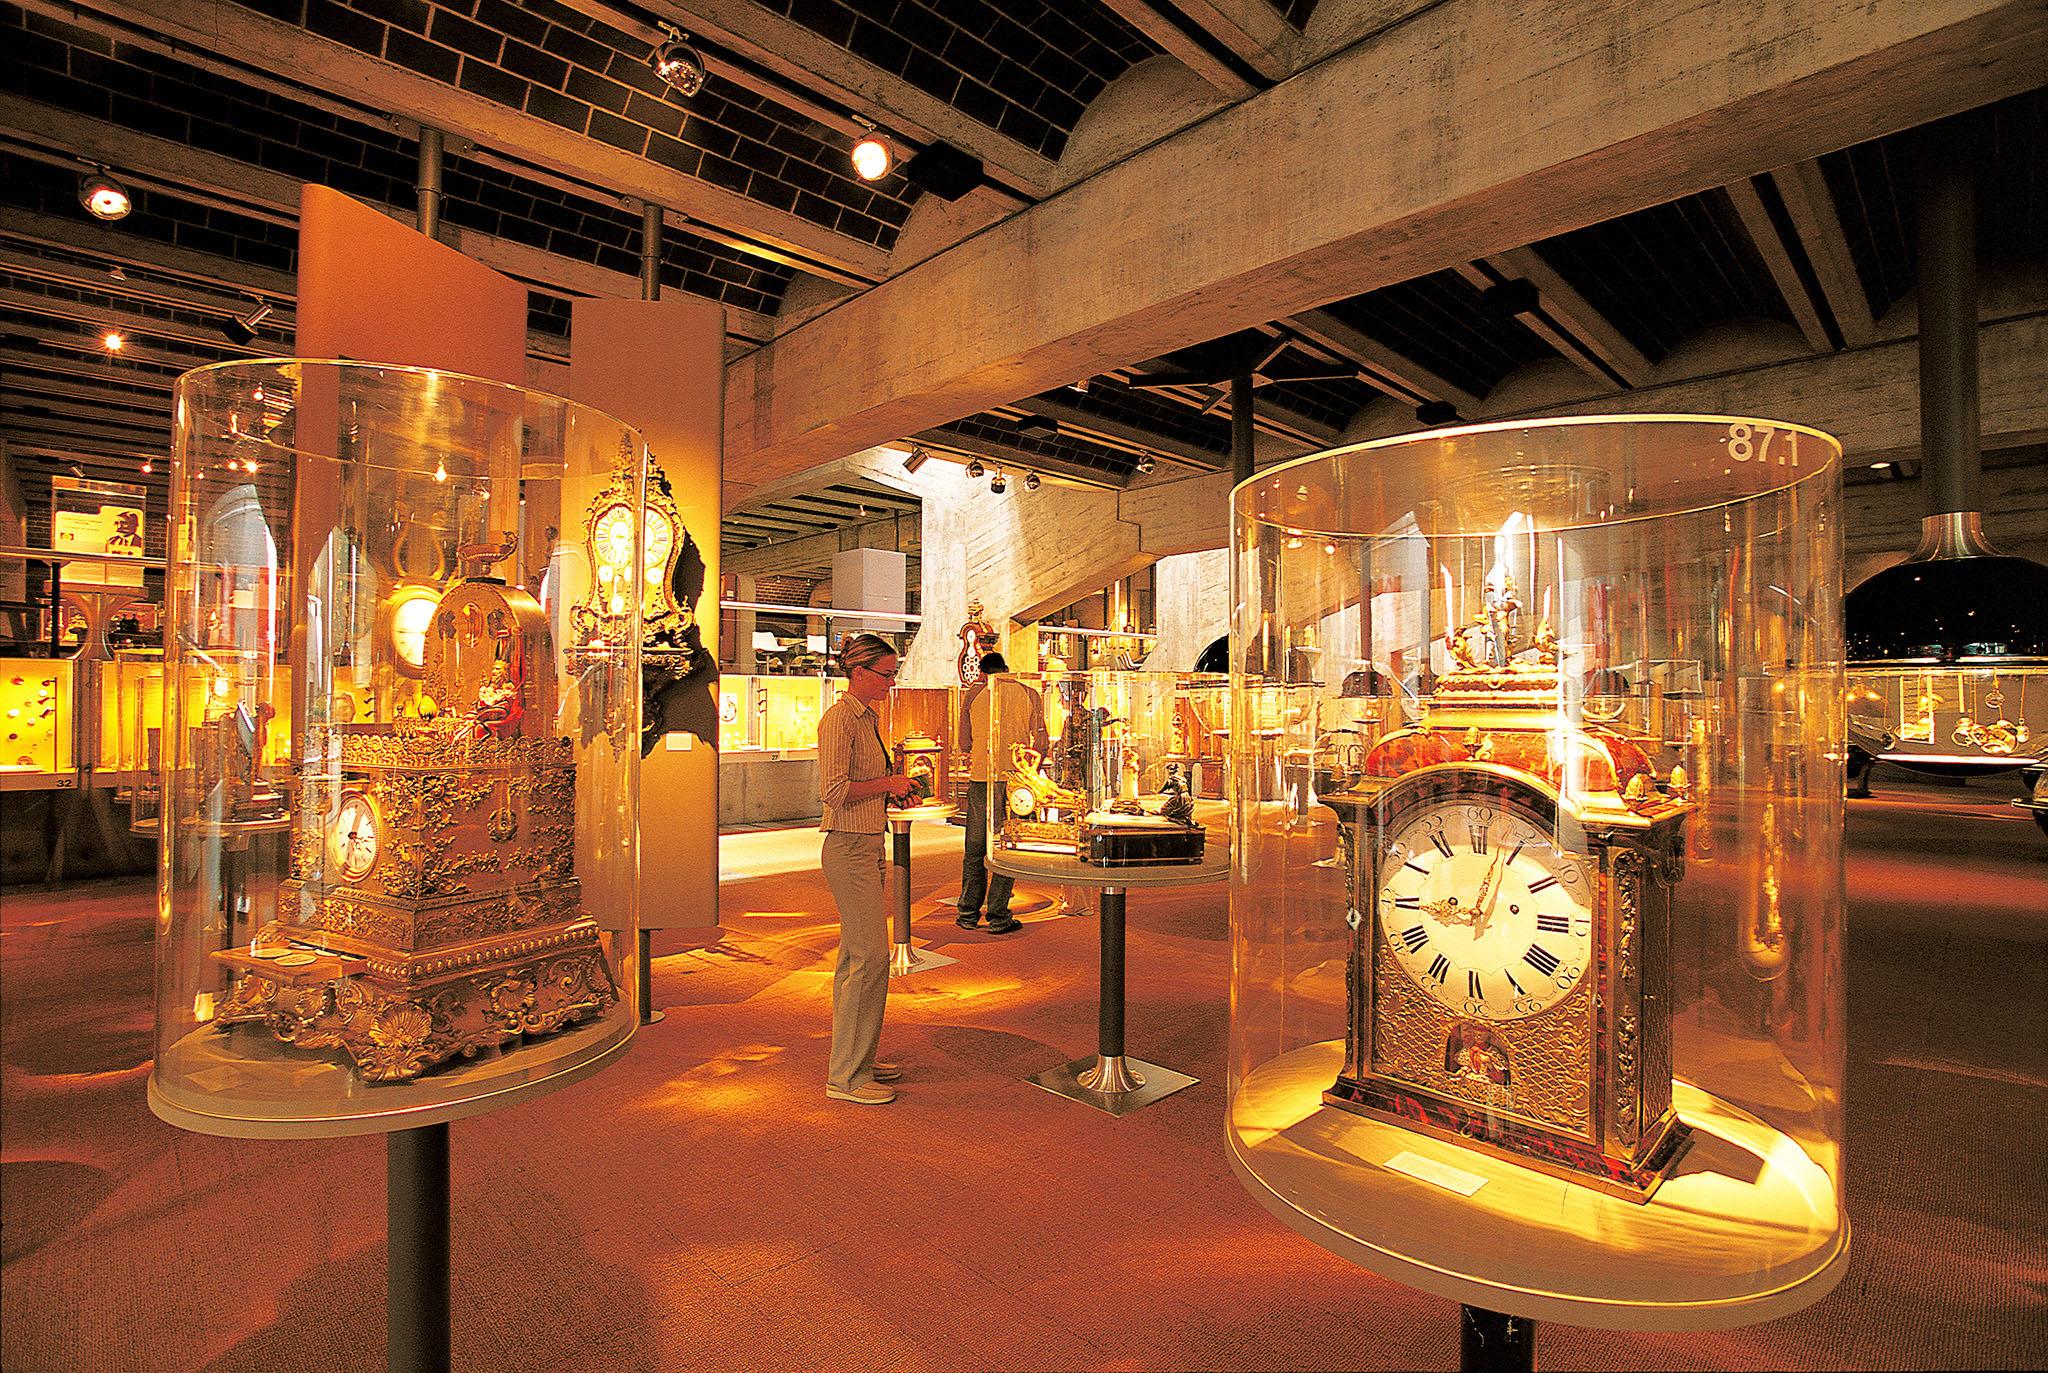 musée international de l'horlogerie